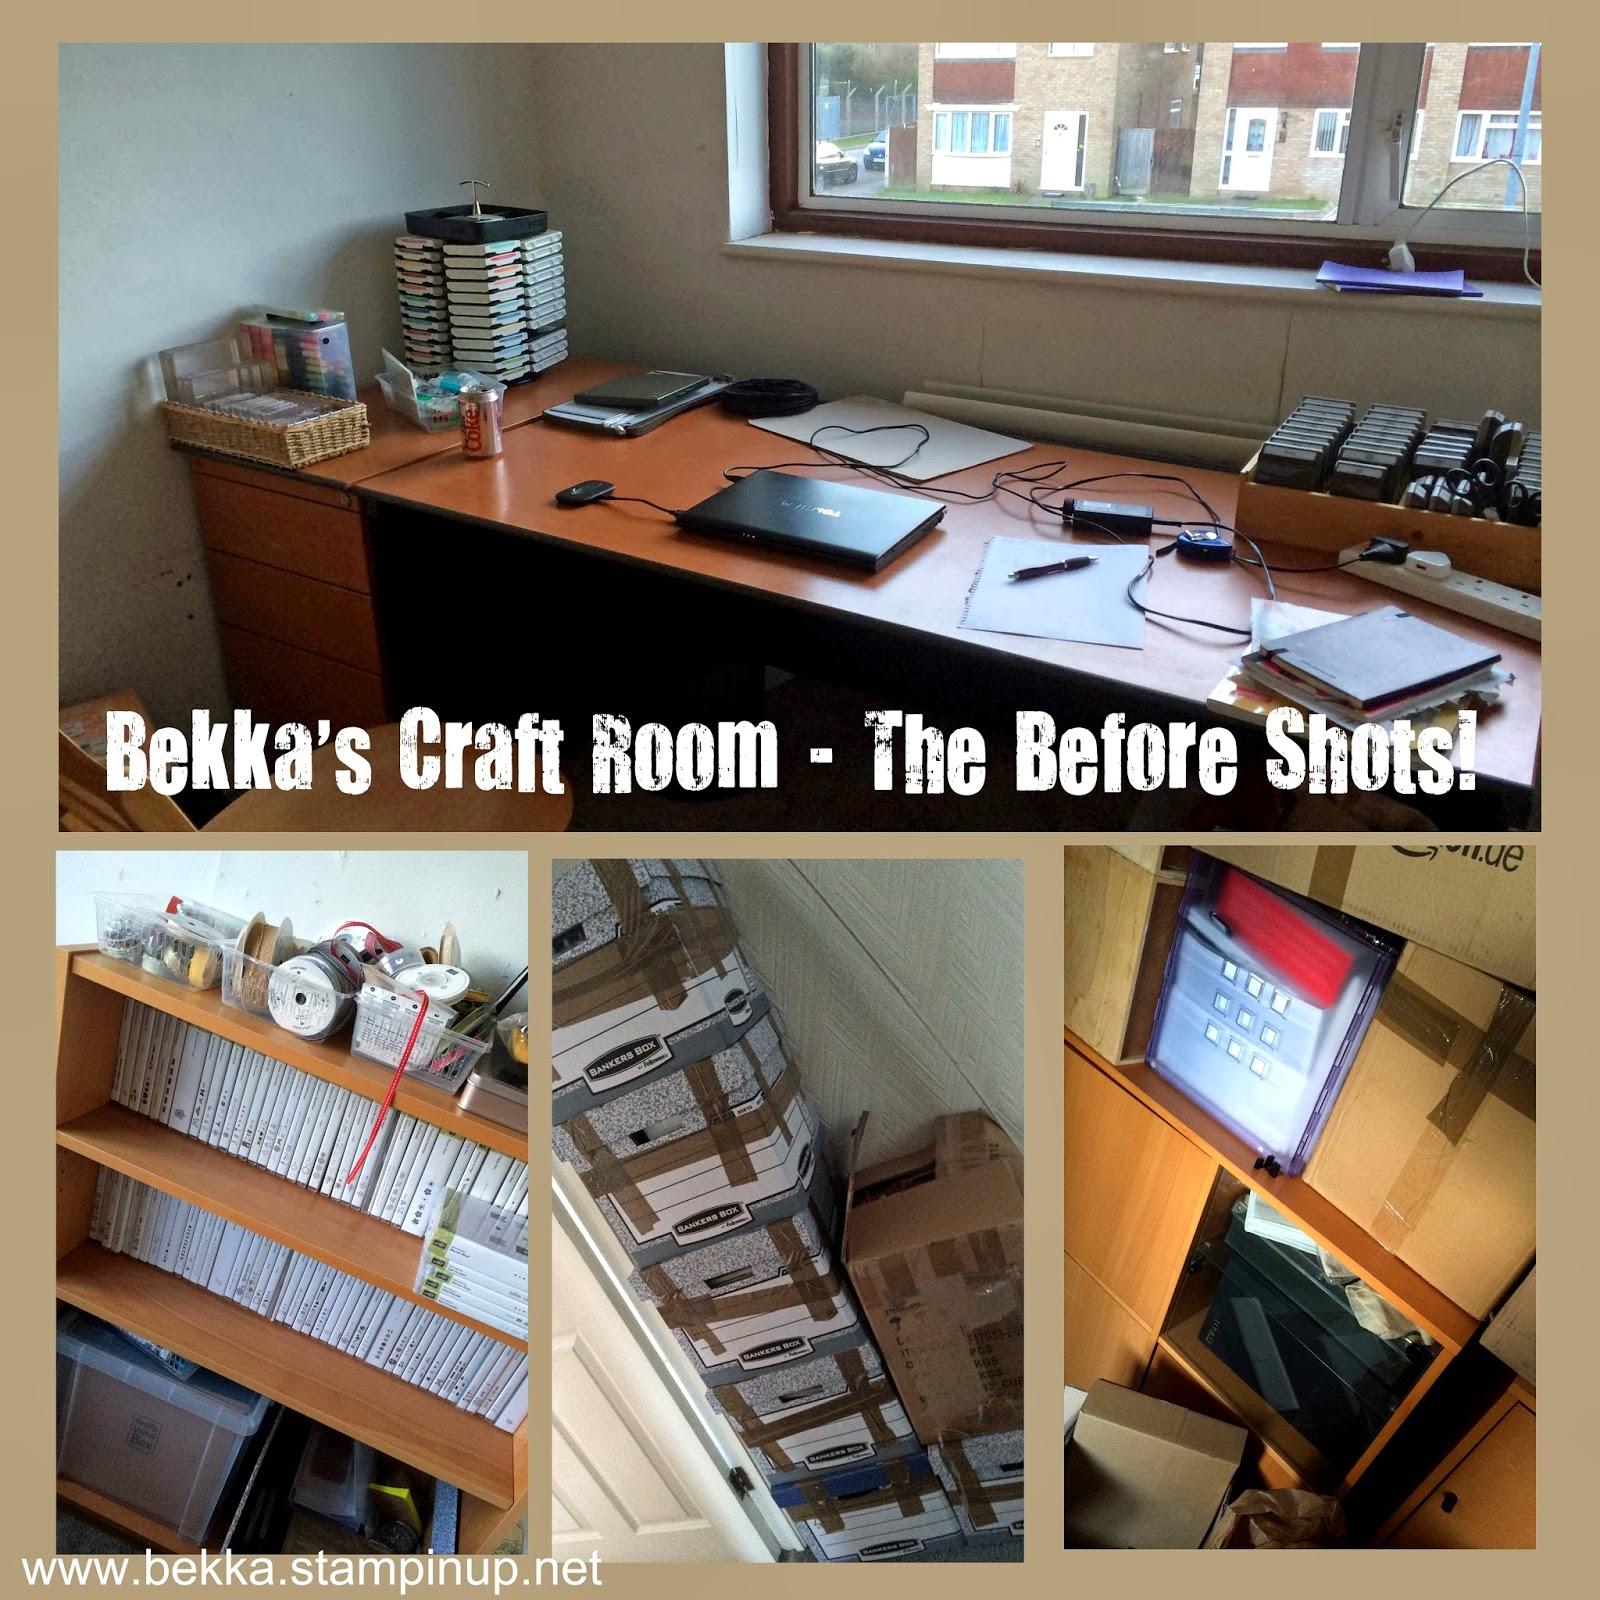 Bekka's Craft Room the Before Shots!